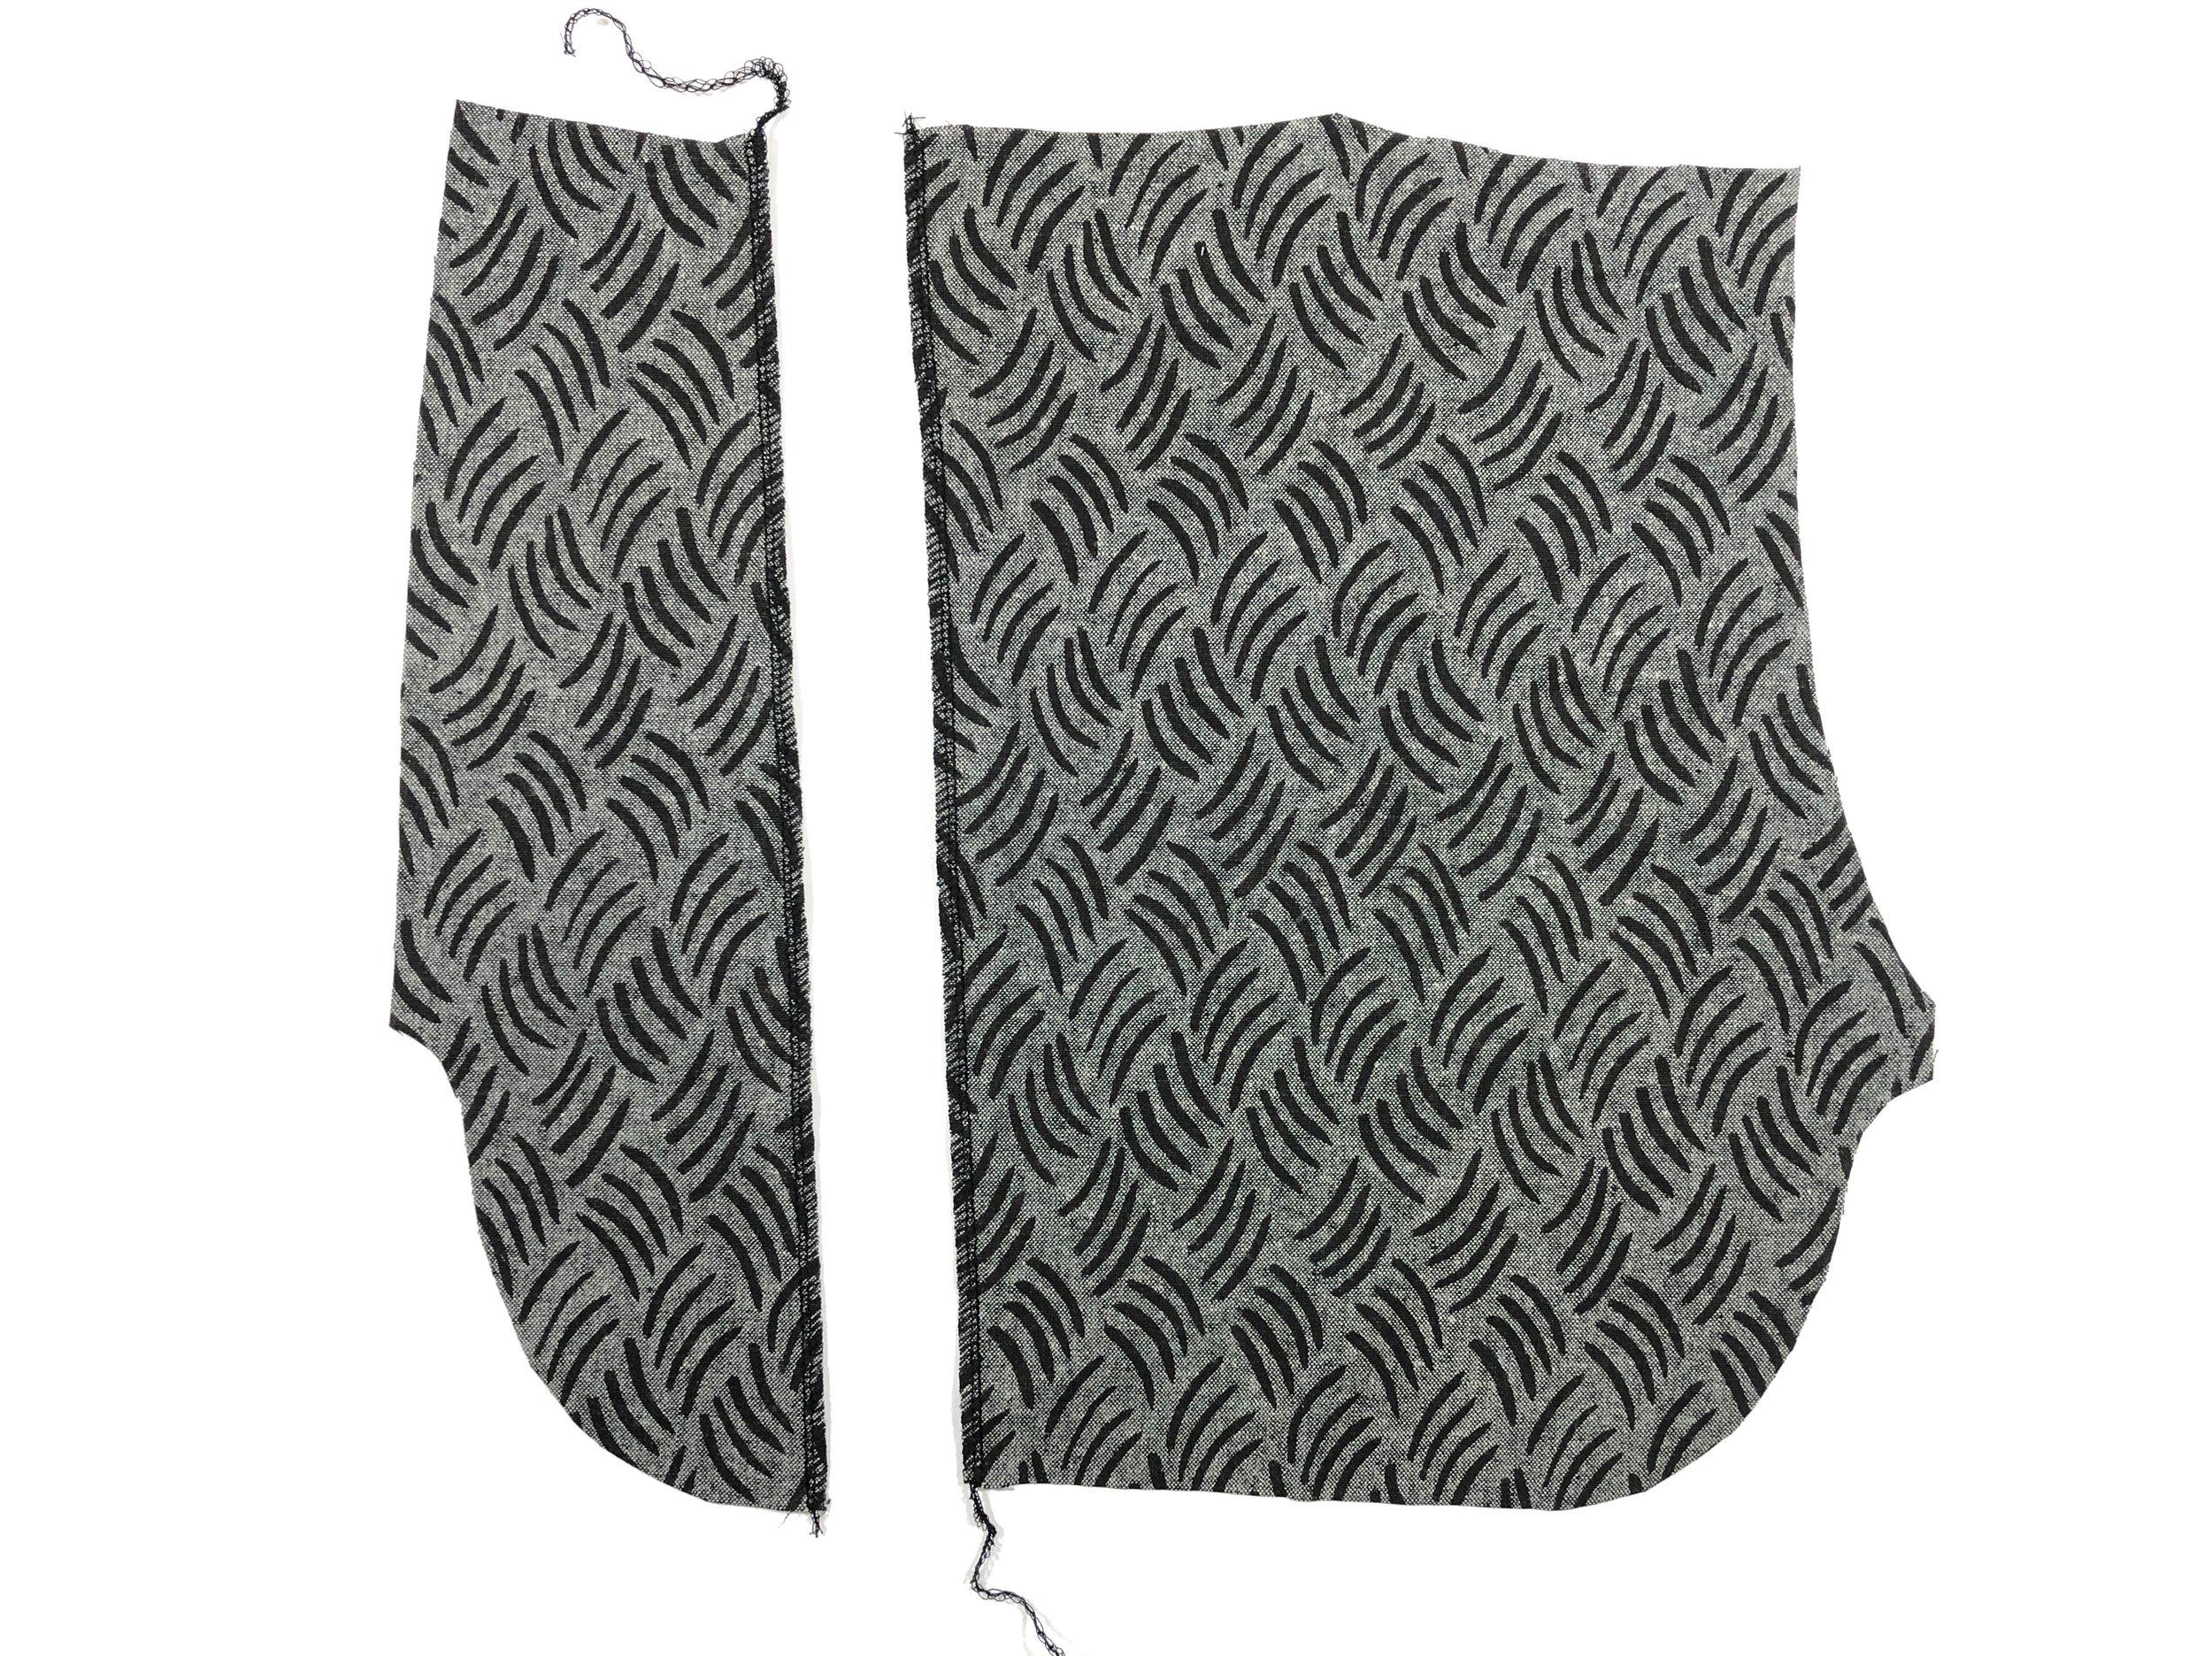 3. Serge/finish zipper opening on right pocket bag.